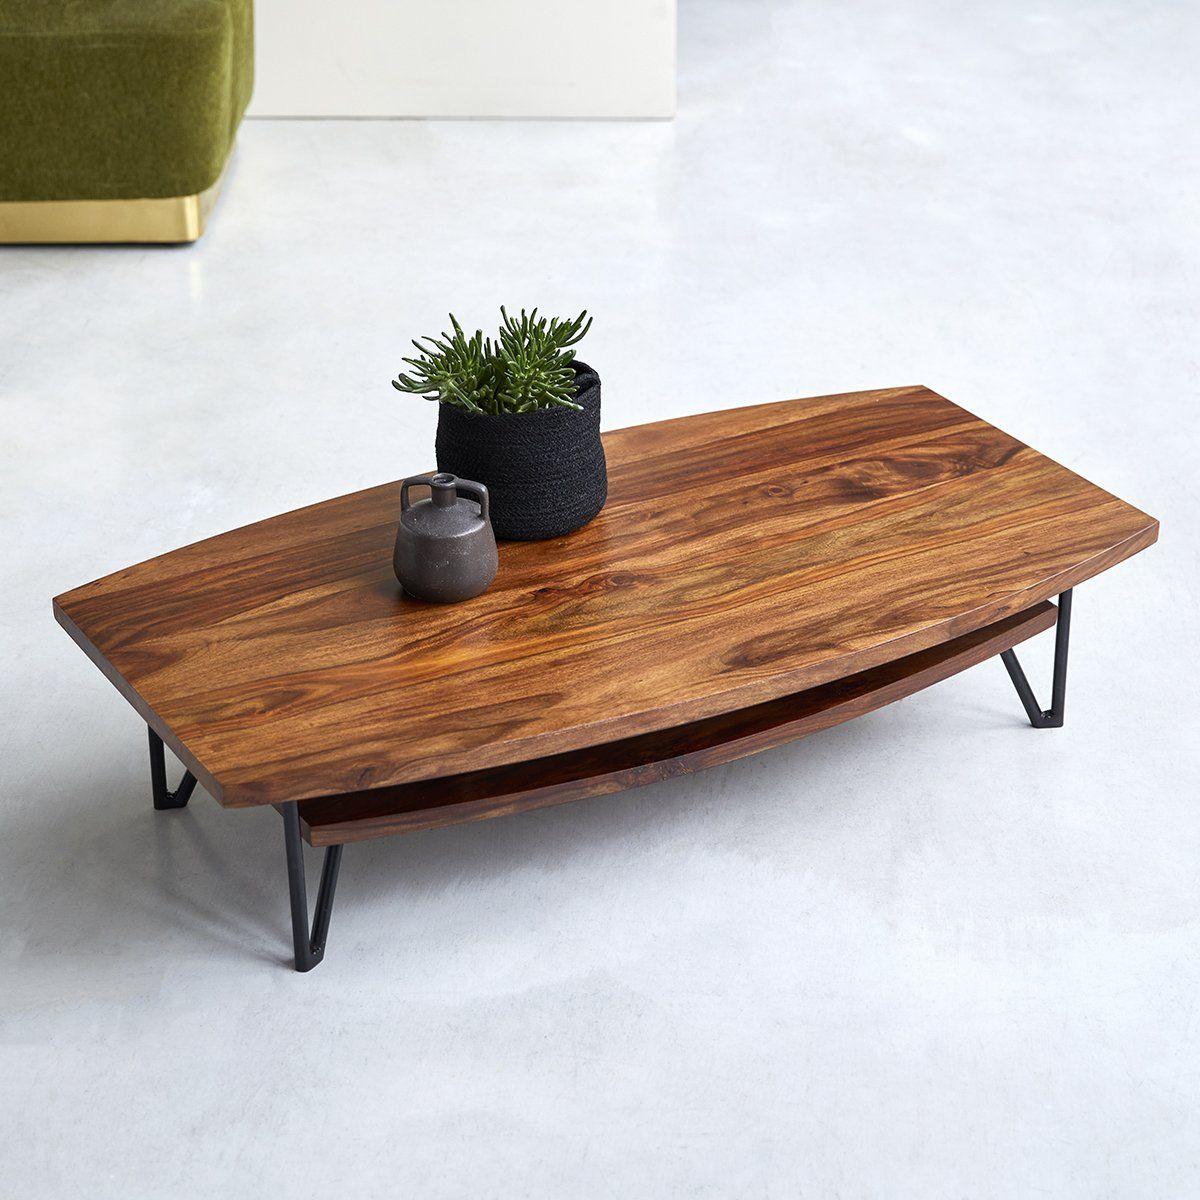 Gaze Burvill Outdoor Furniture Designers Gartentisch Holz Im Freien Garten Essgruppe